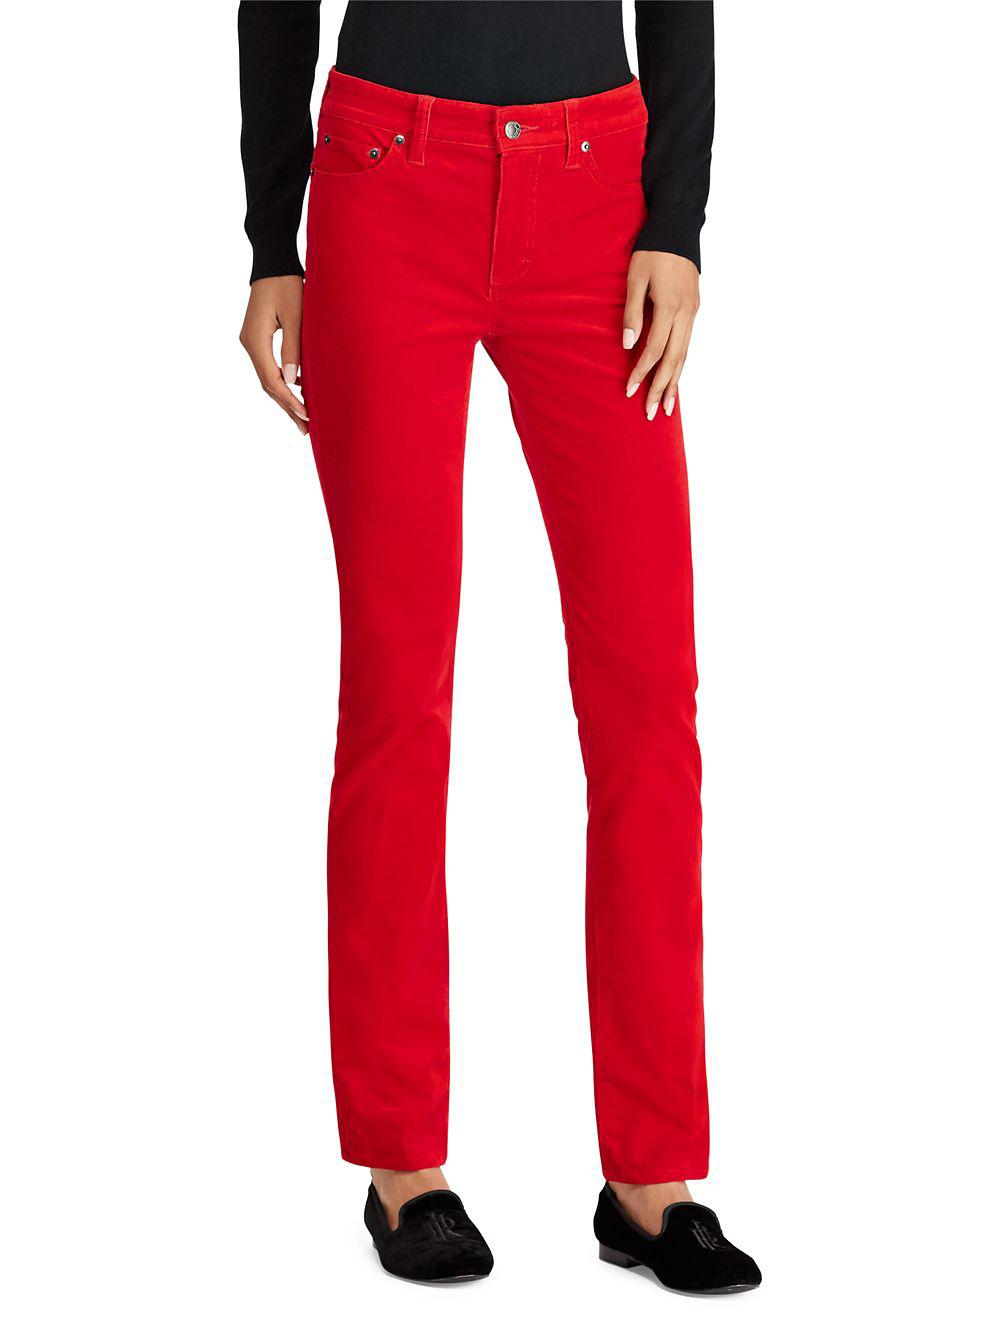 f17532ca4f78c Lyst - Lauren By Ralph Lauren Classic Slim-fit Jeans in Red